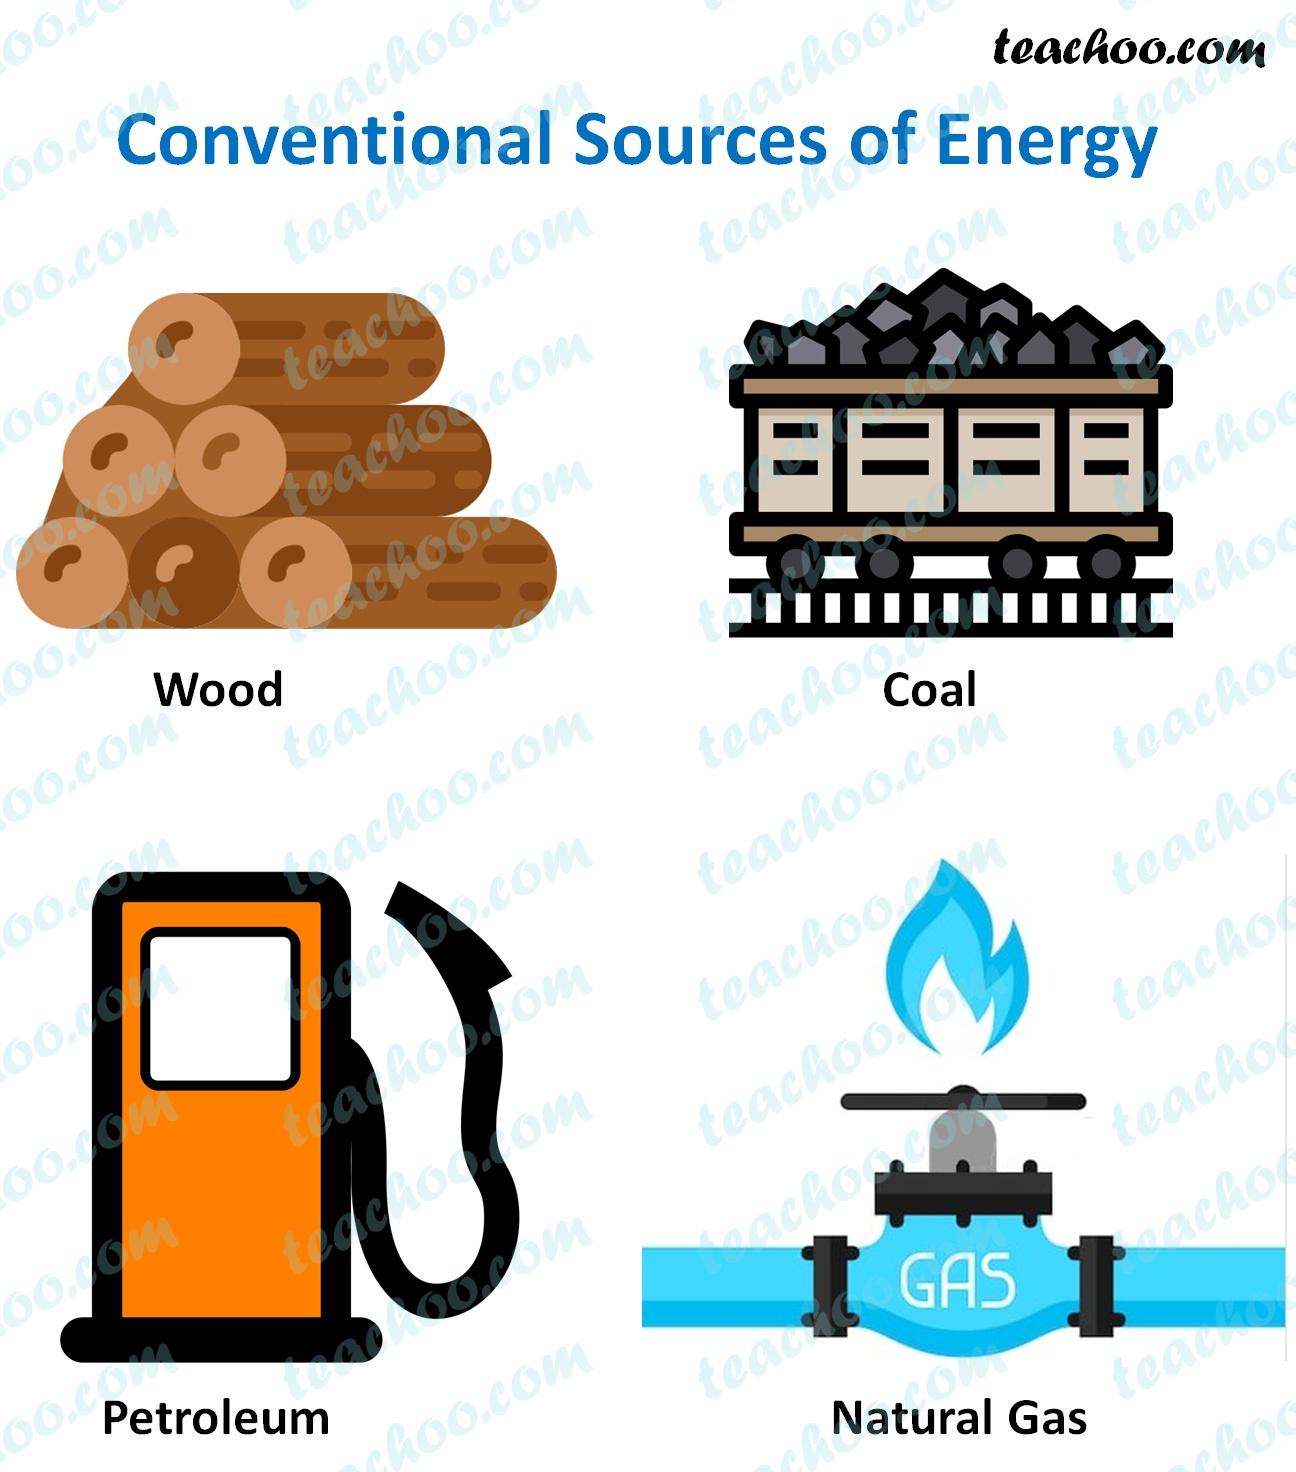 conventional-sources-of-energy---teachoo (1).jpg